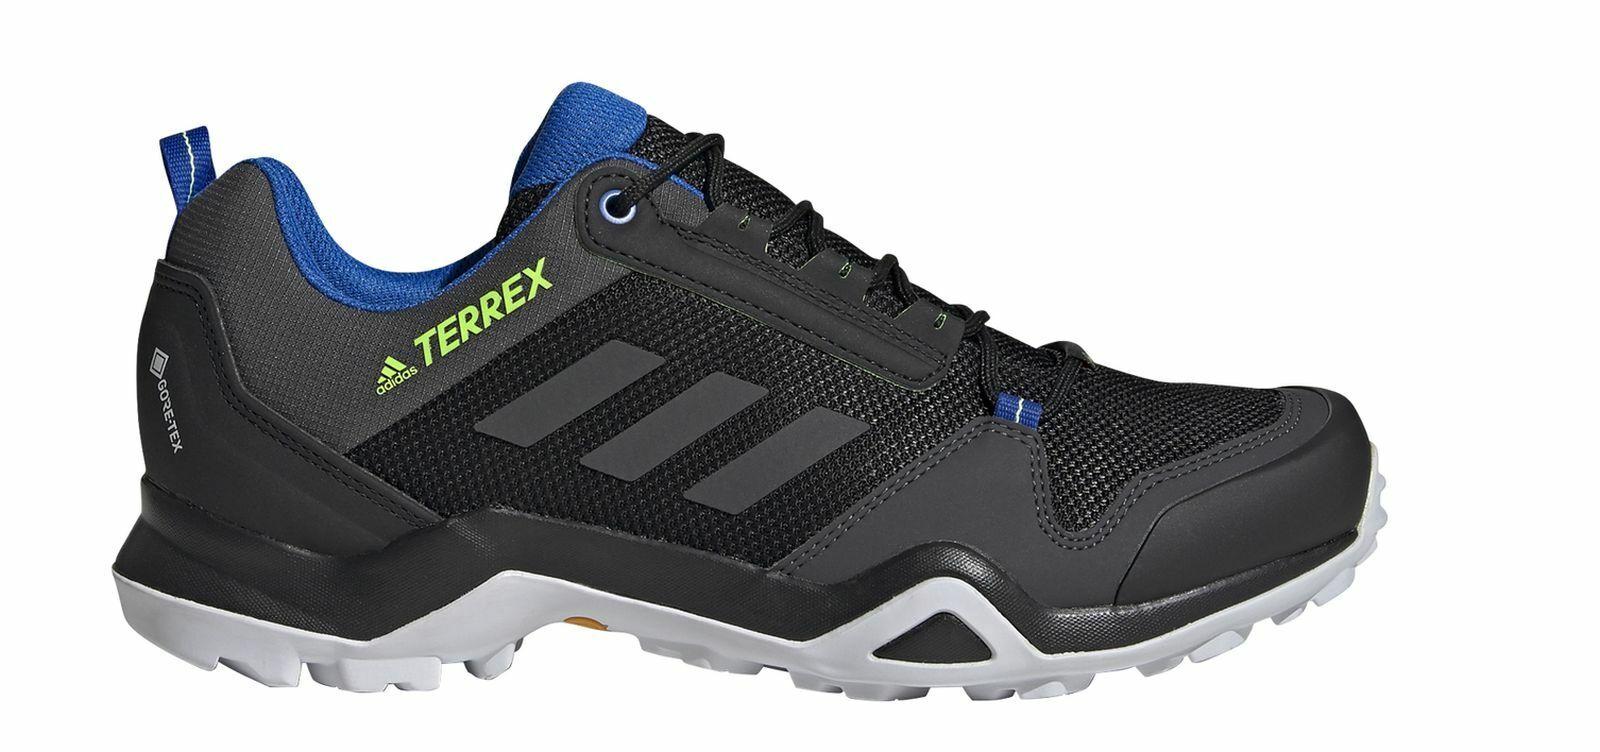 Adidas Performance Herren Trekking Schuh TERREX AX3 GTX schwarz grau